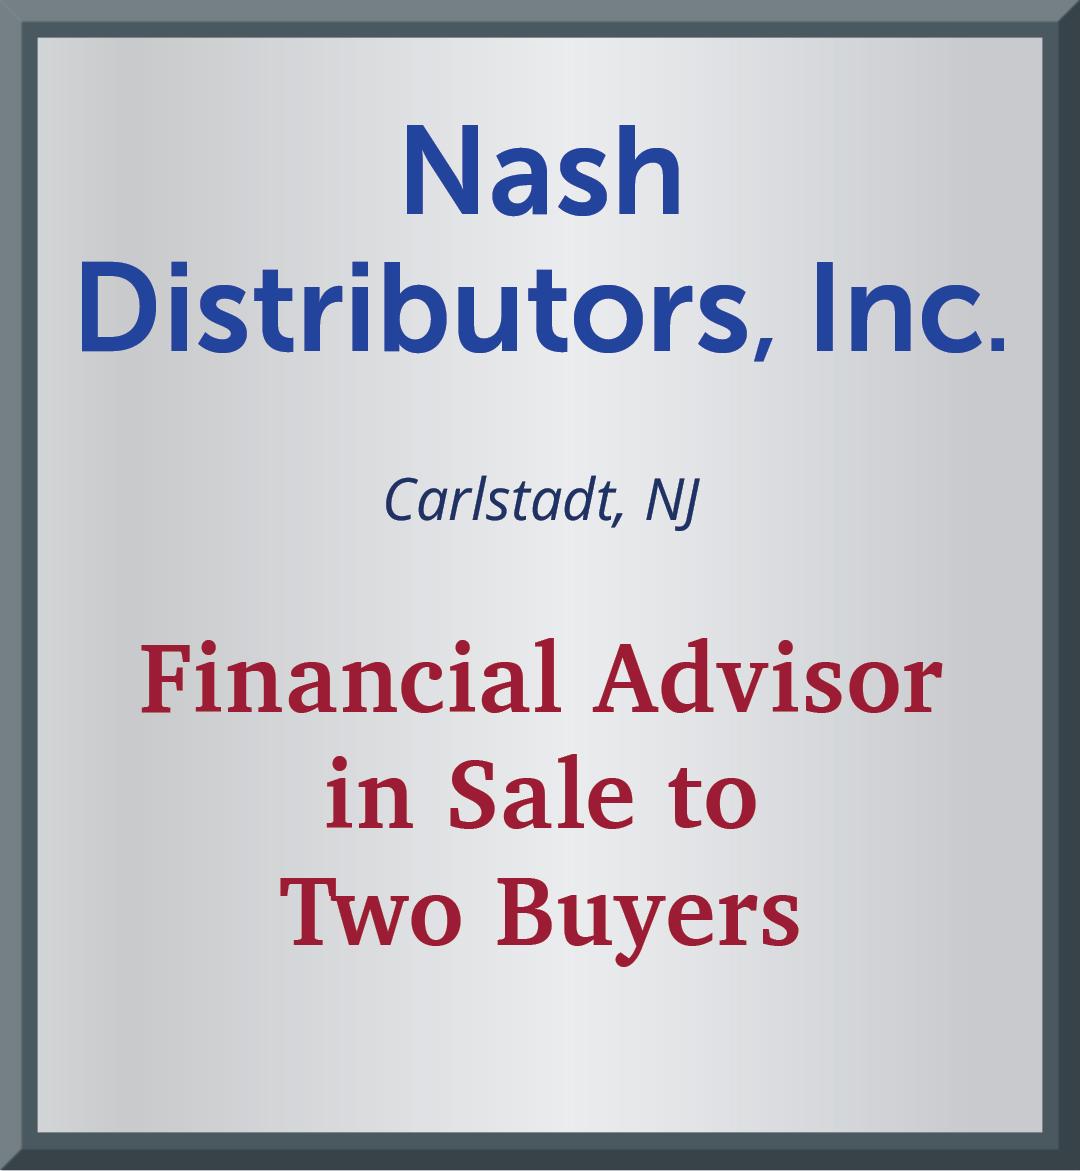 Nash-Dist